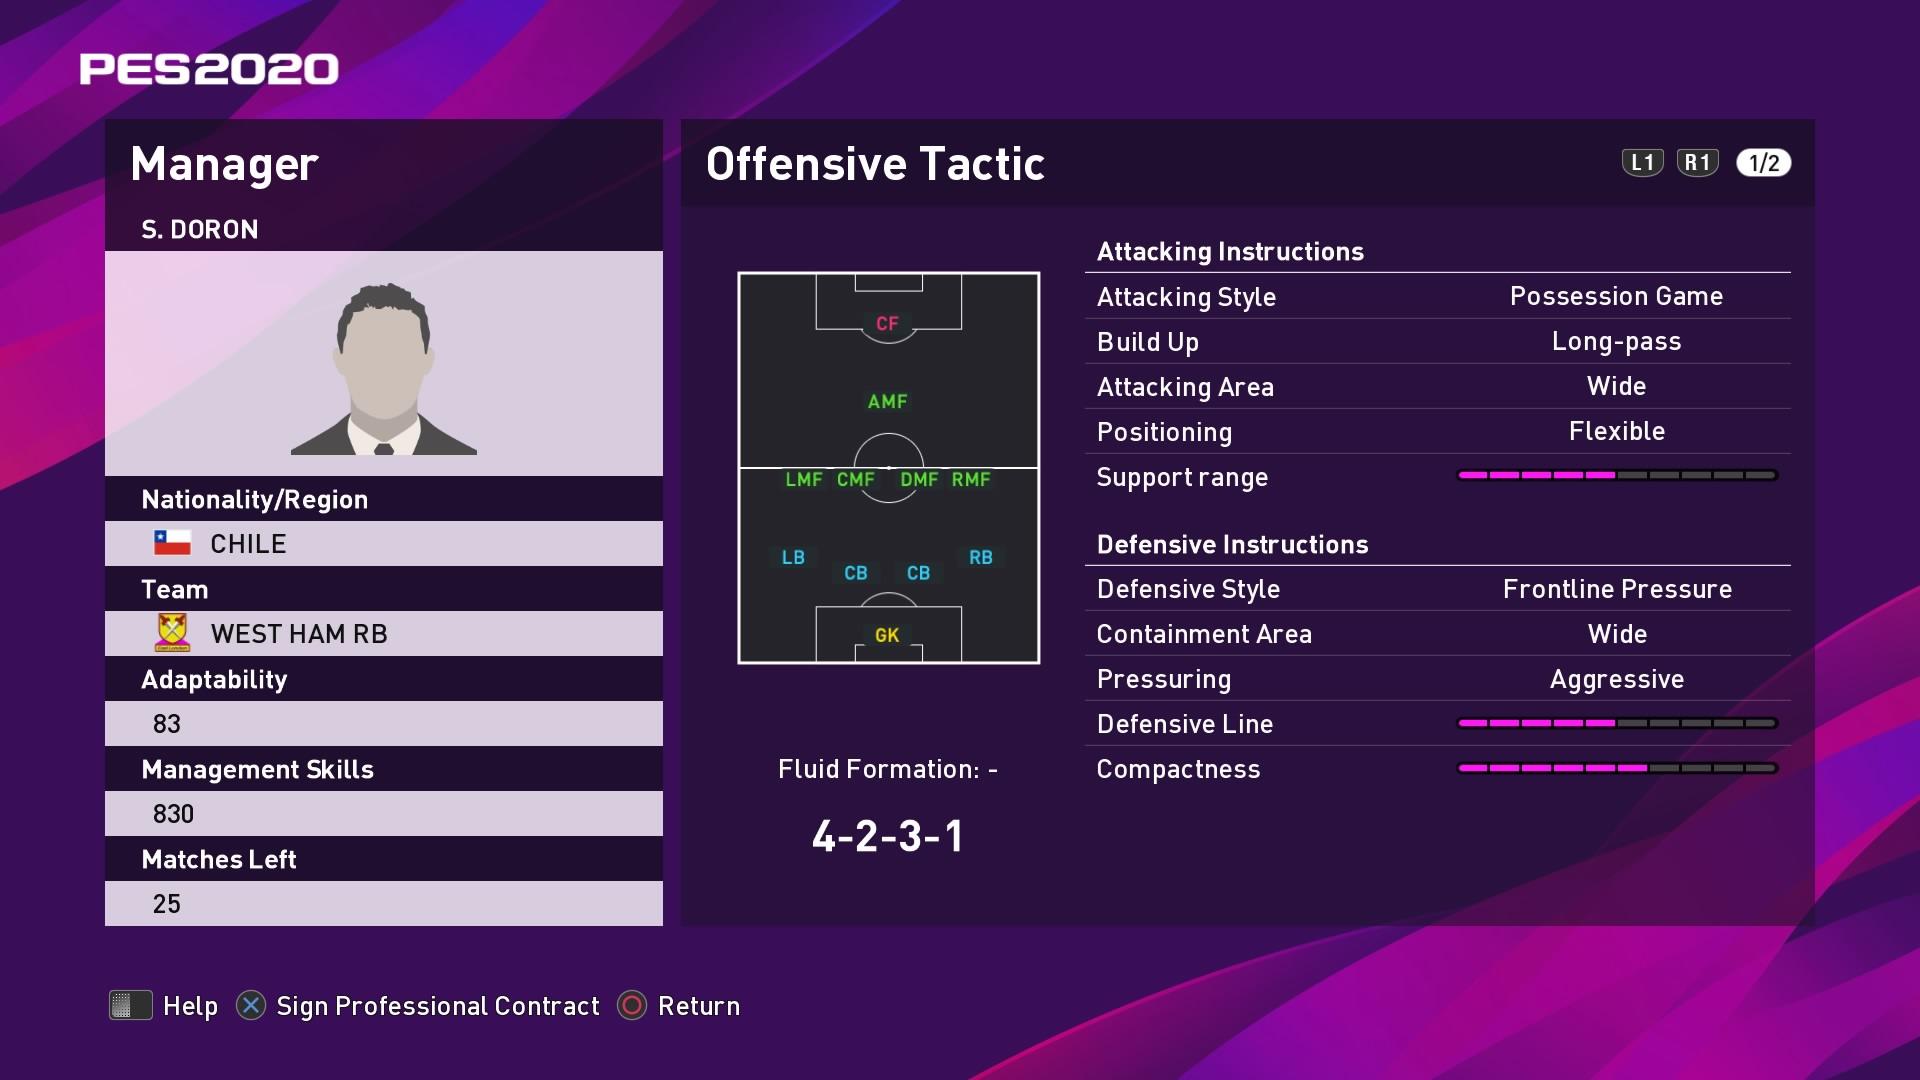 S. Doron (Manuel Pellegrini) Offensive Tactic in PES 2020 myClub